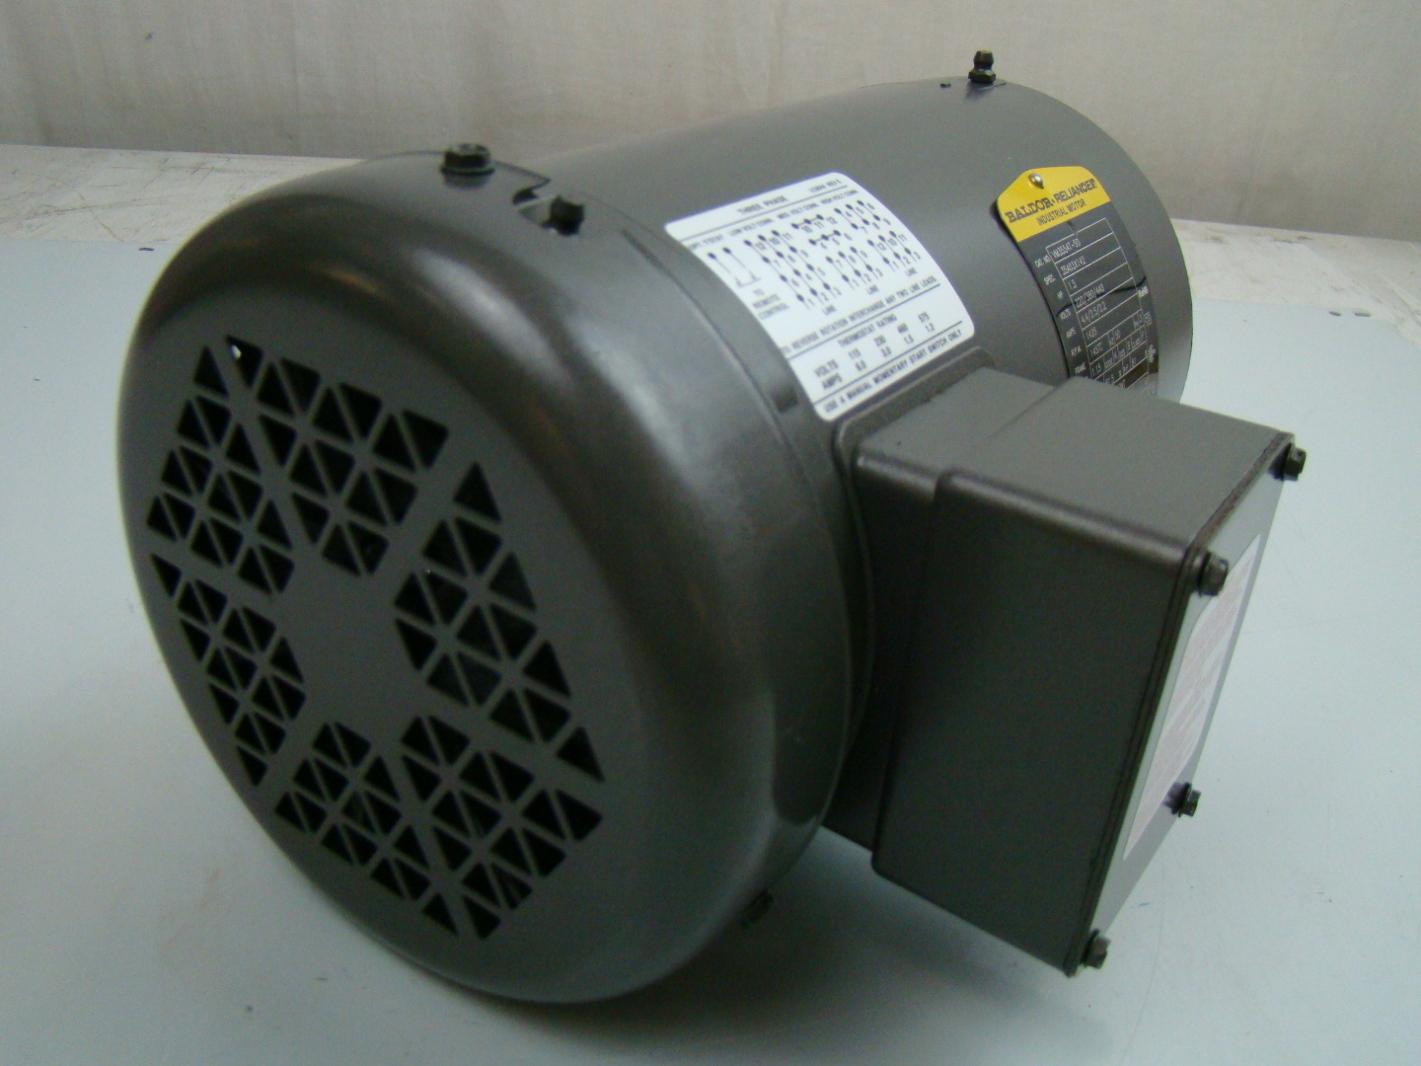 Baldor 1 5 hp 1425 rpm electric motor vm3554t 50 ebay for Circuit breaker for 7 5 hp motor